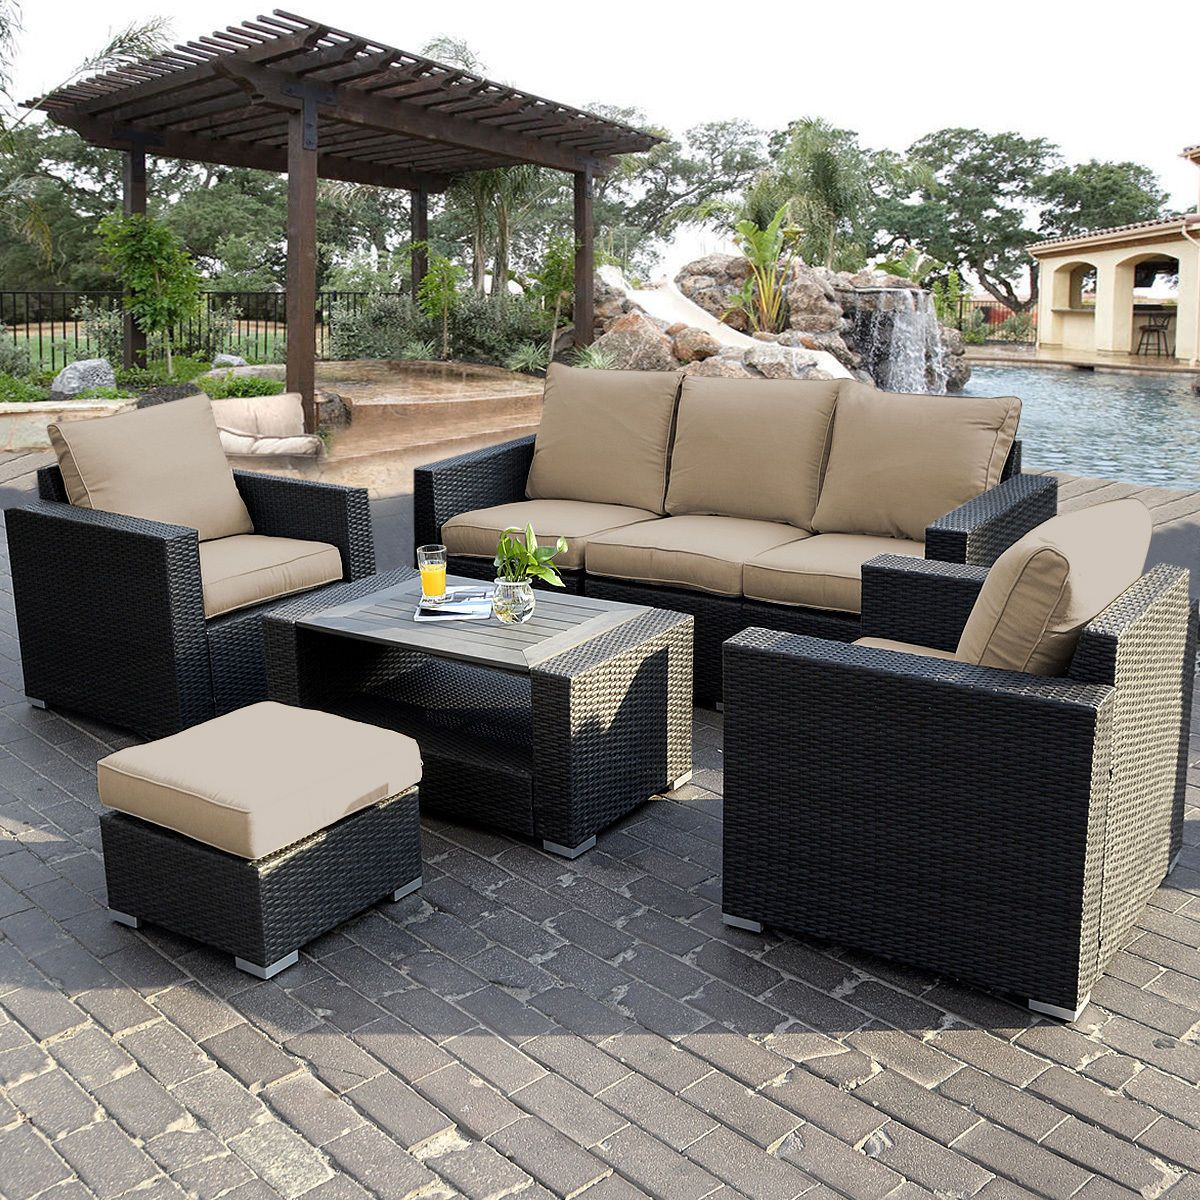 Best 7Pc Outdoor Patio Sectional Furniture Pe Wicker Rattan 400 x 300